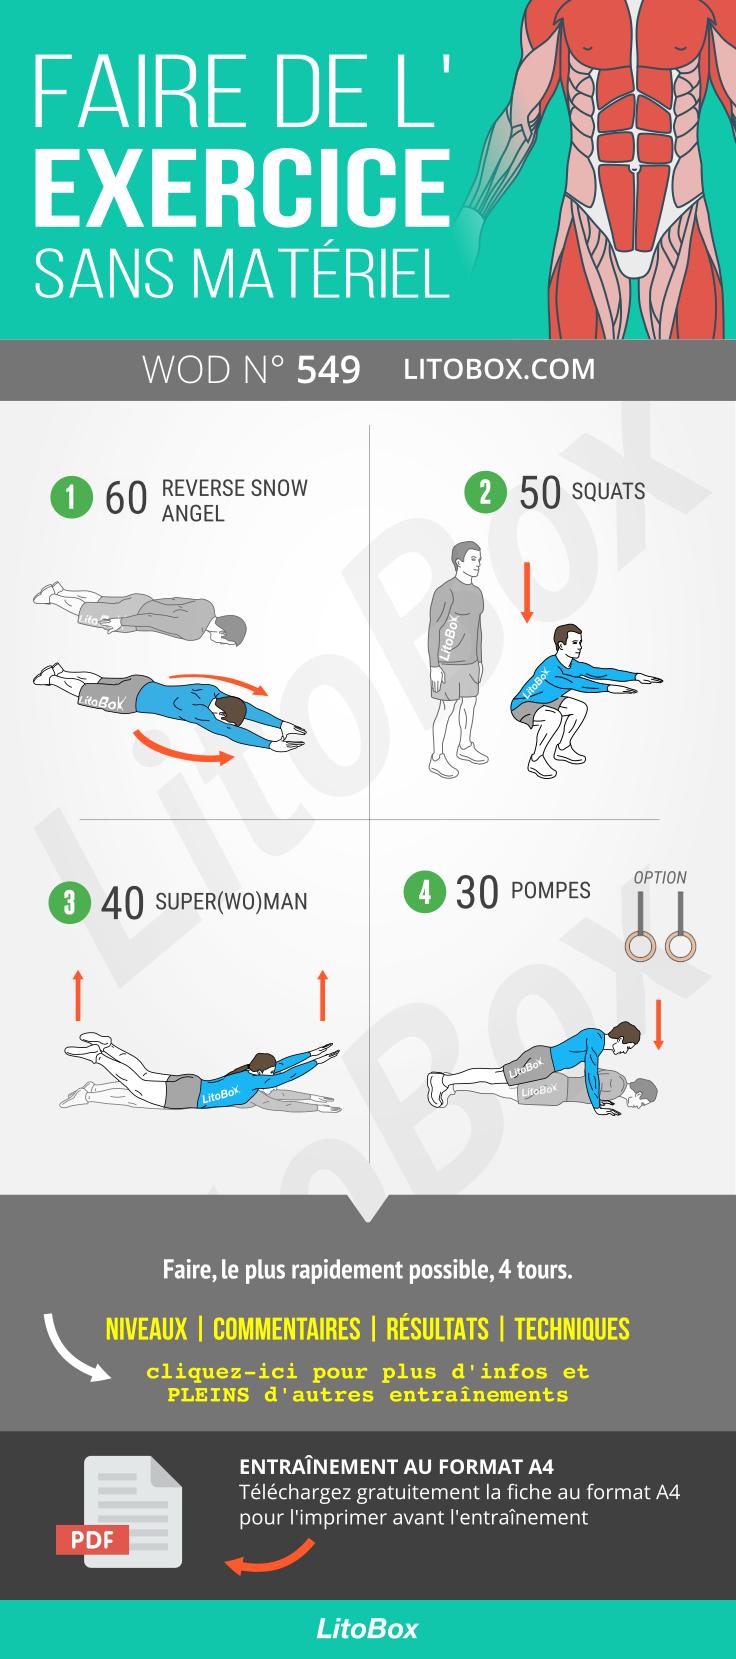 Exercice Sans Materiel Pdf A Telecharger Exercice Musculation Sans Materiel Exercice Musculation Exercice Musculation Dos